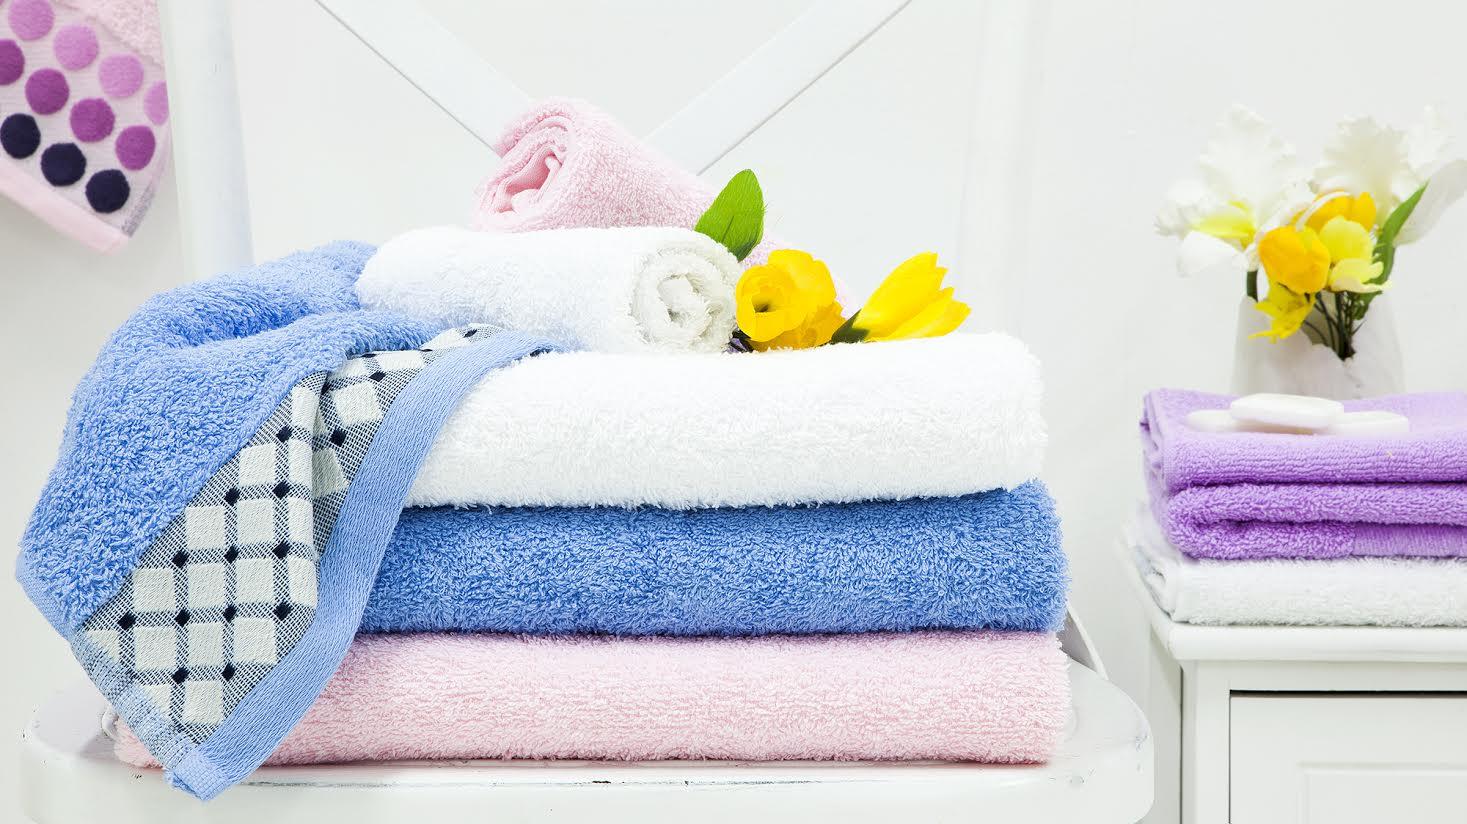 полотенца для ванны в доме